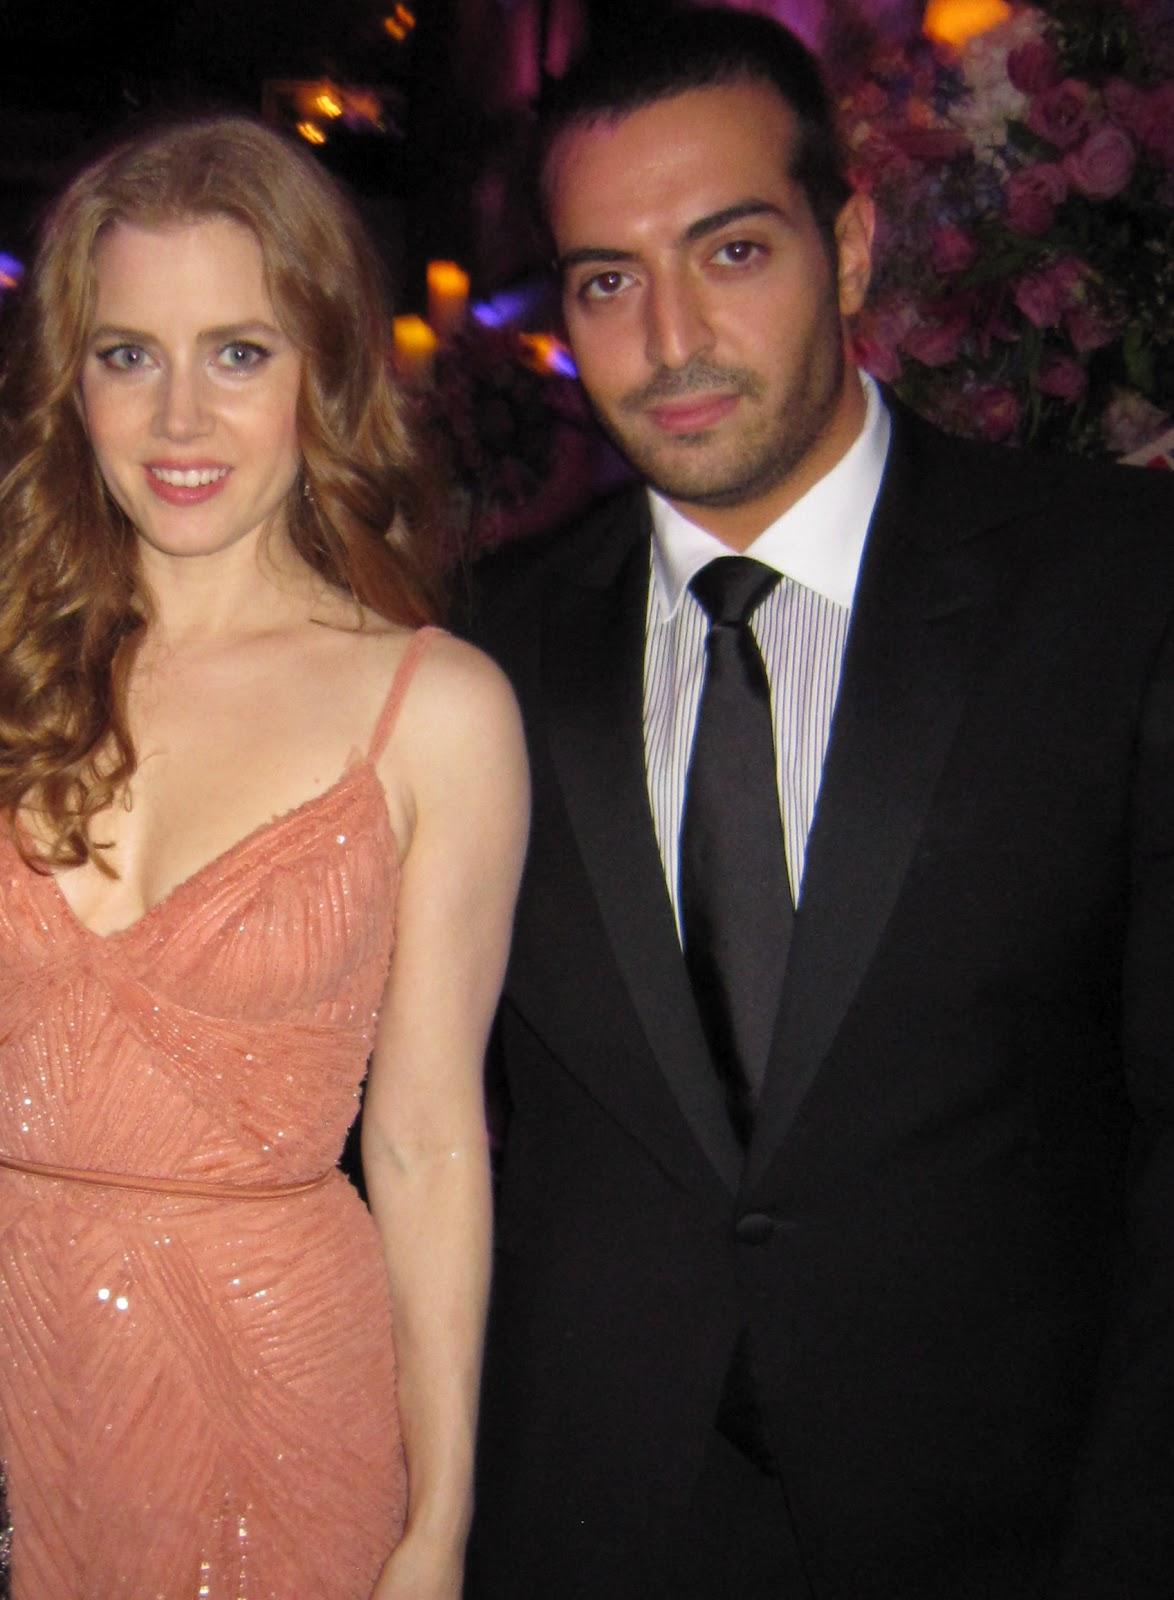 Mohammed al turki dating